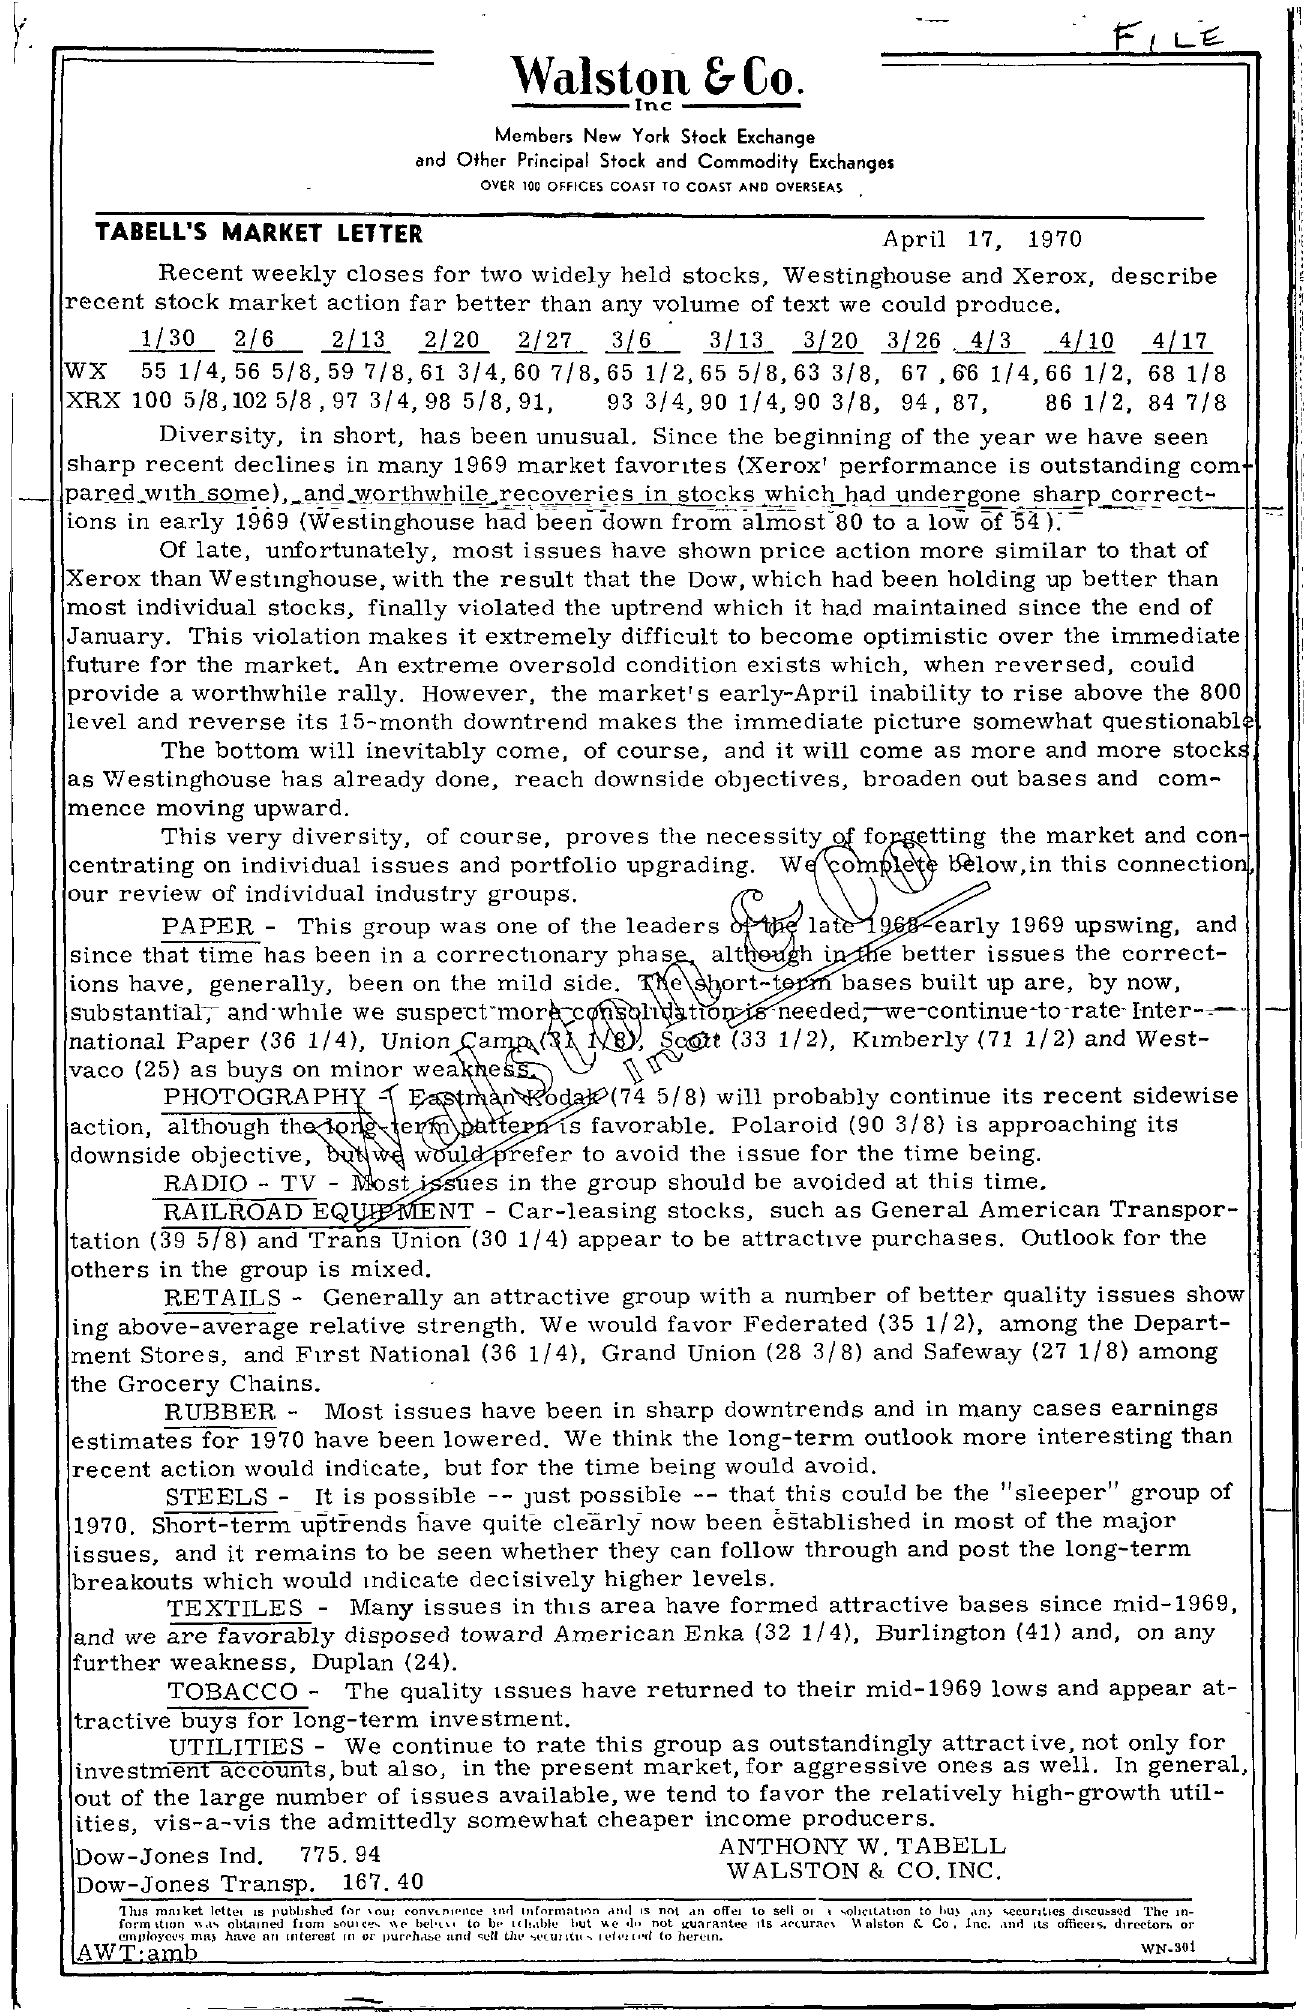 Tabell's Market Letter - April 17, 1970